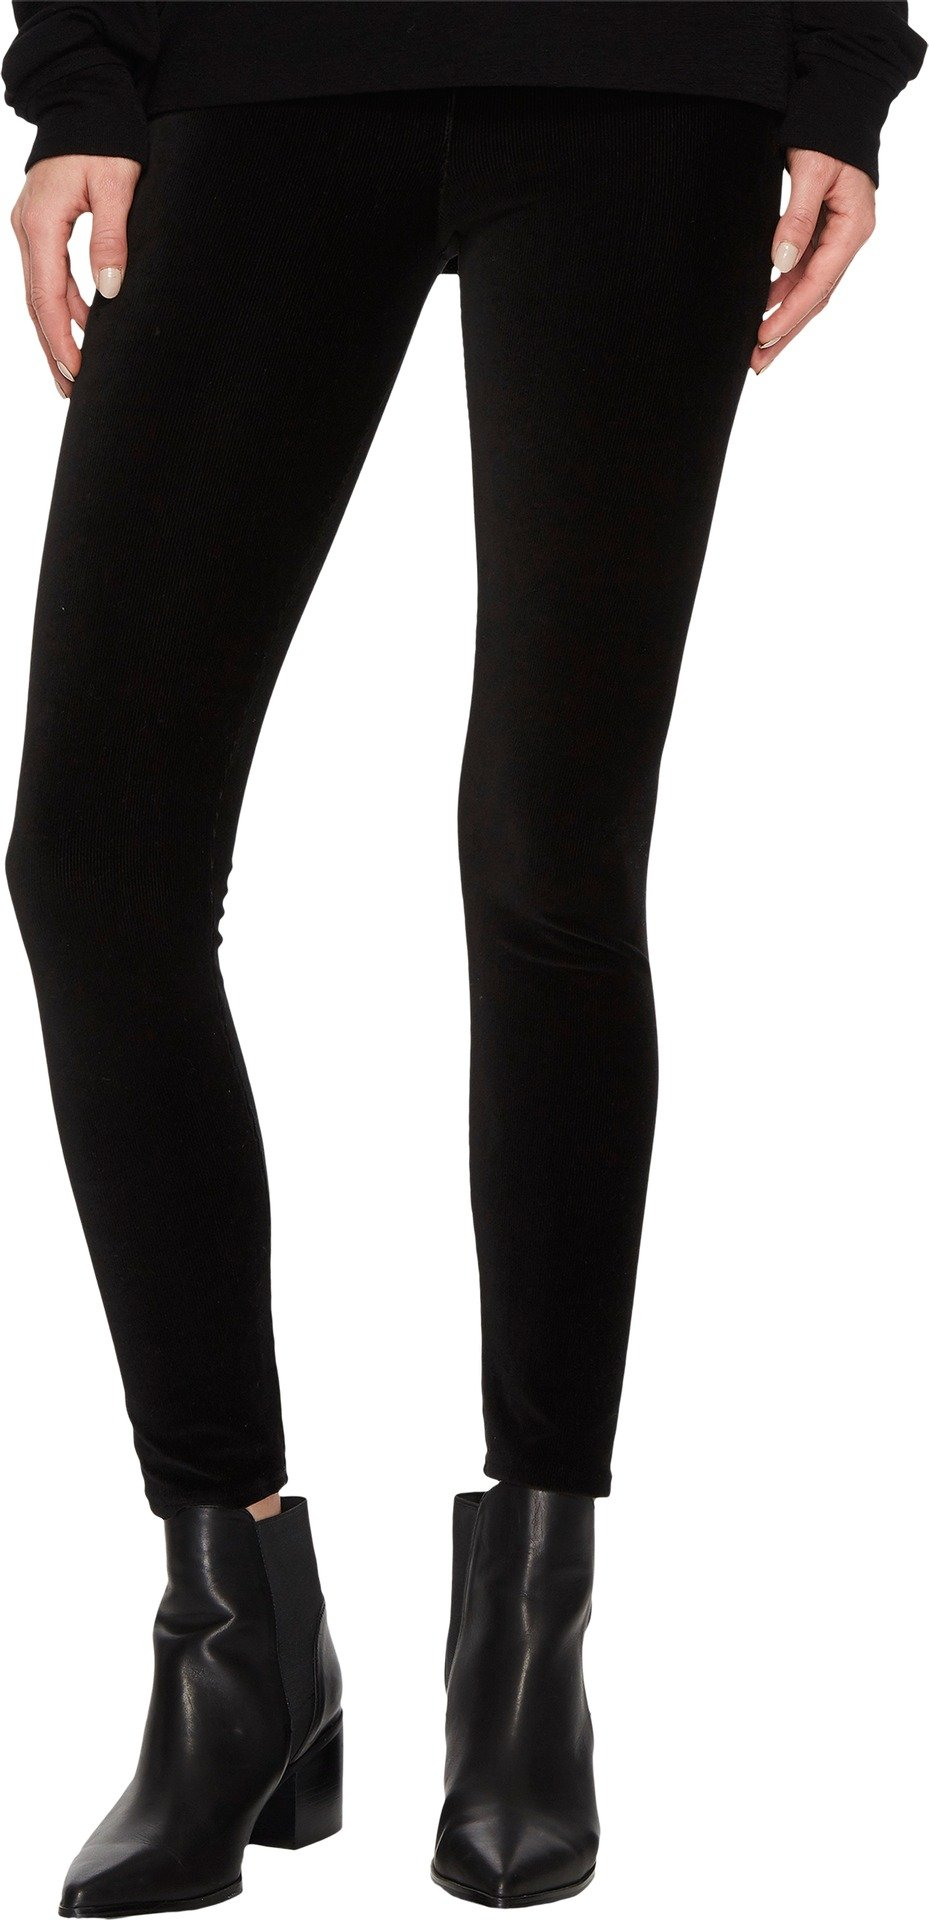 Vince Women's Stretch Corduroy Leggings Black Small